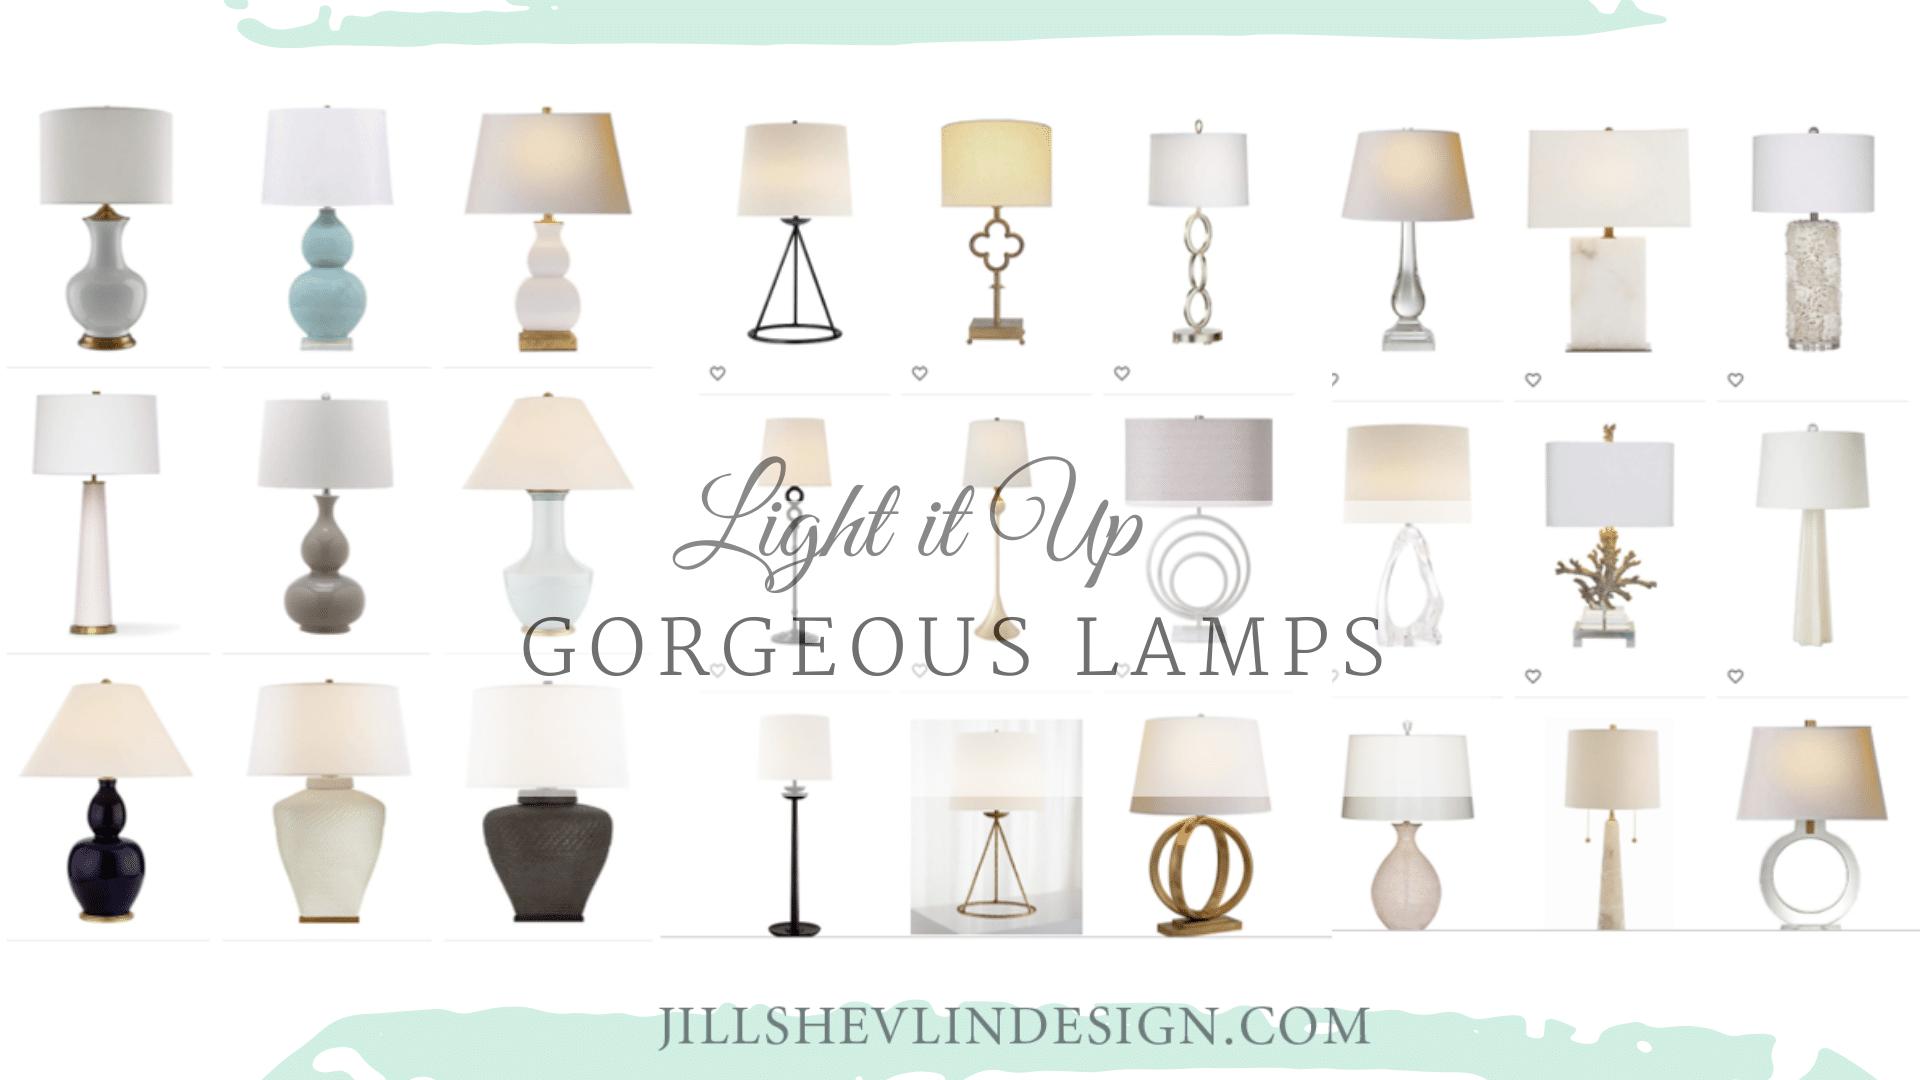 Lamps, Lamps, Lamps Jill Shevlin Design Vero beach Luxury Interior Designer Coastal Modern Home Decor